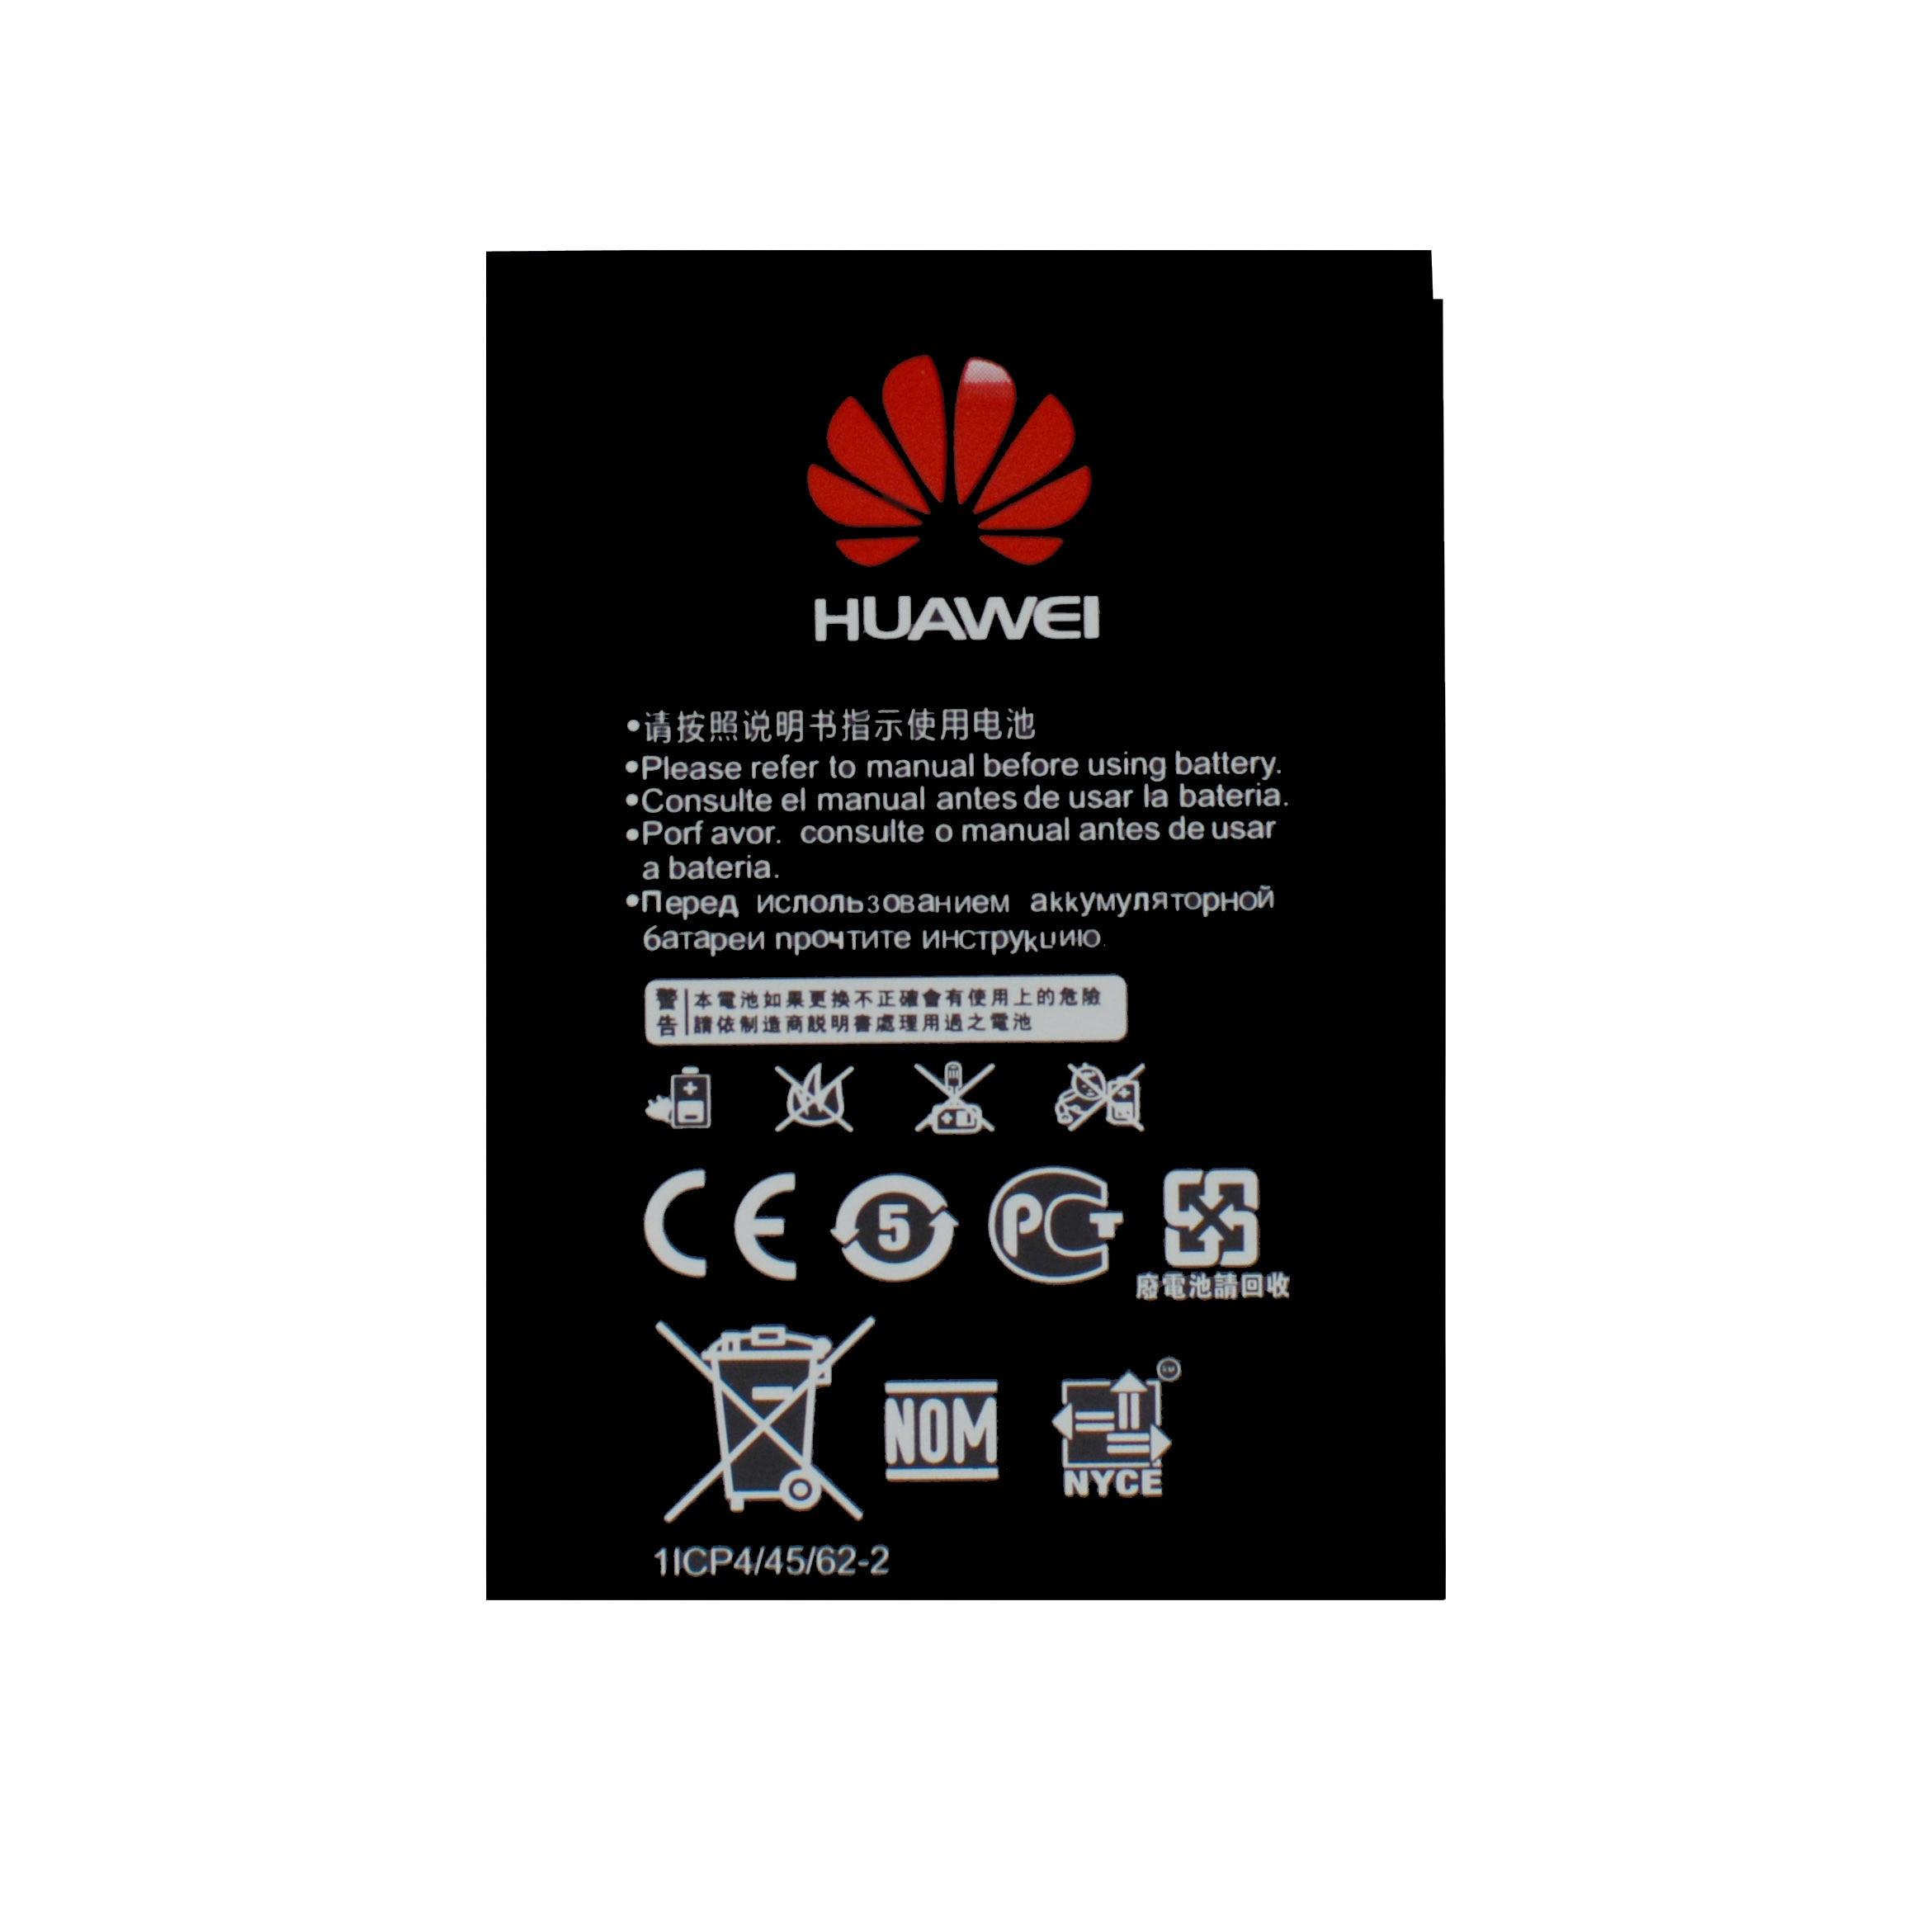 20pcs/lot 100% Original Battery HB824666RBC For Huawei E5577 E5577Bs-937 E5577s-321 WIFI Router Phone Batteria Real 3000mAh enlarge